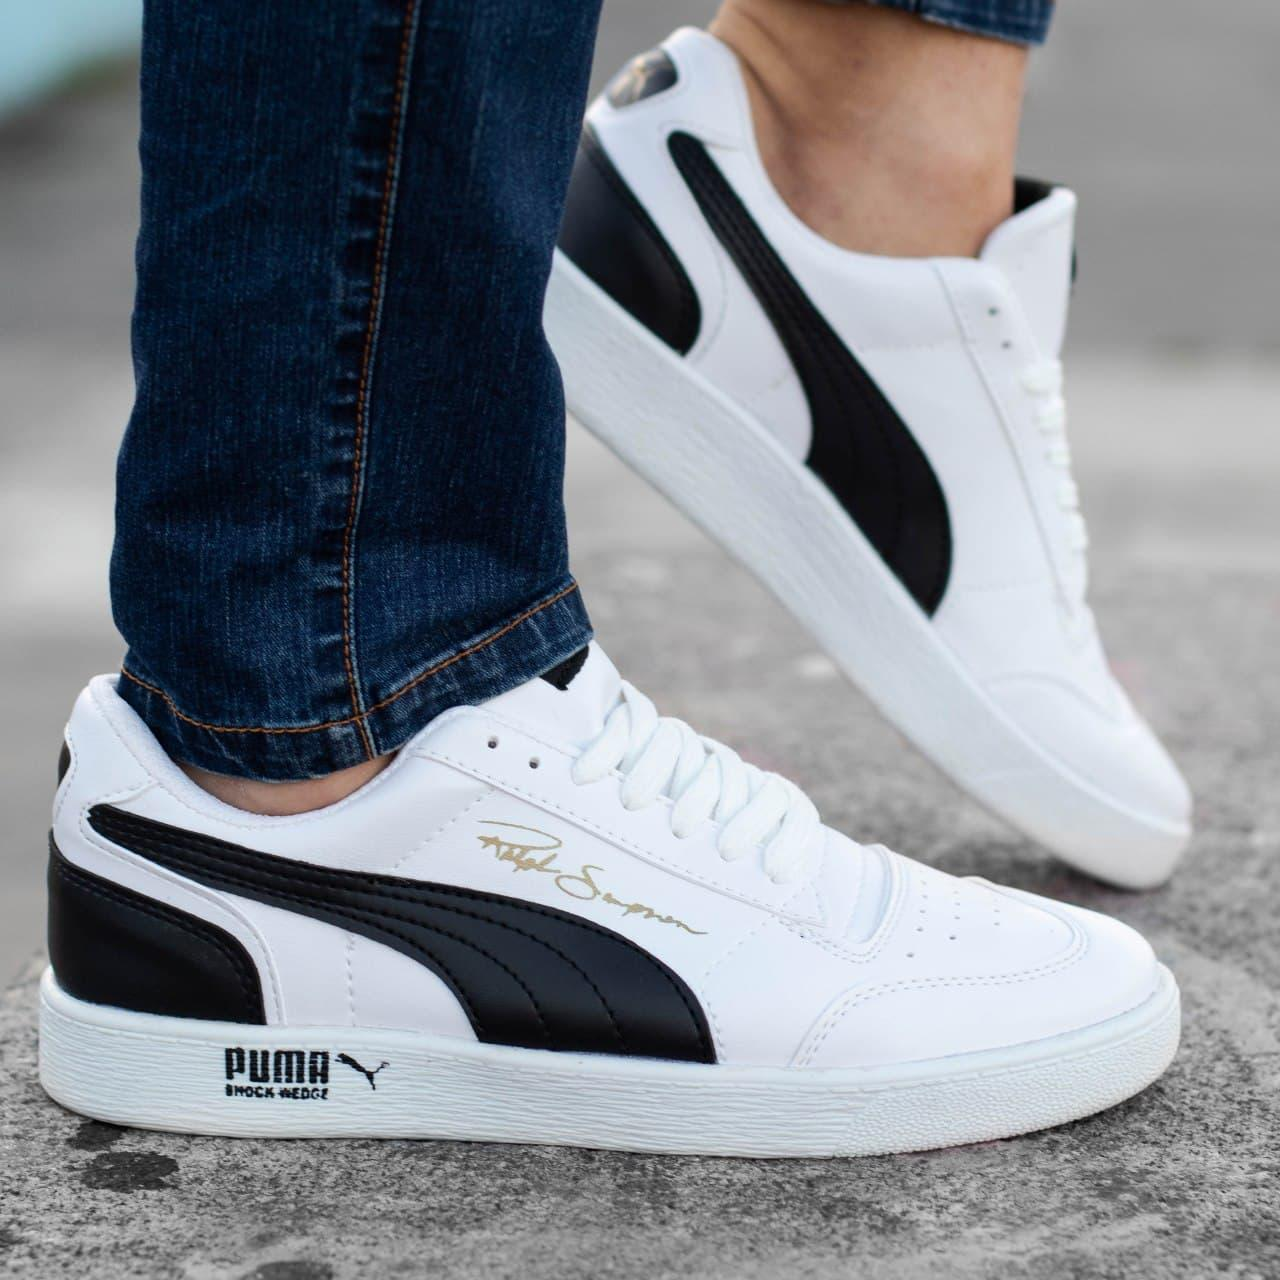 Мужские кроссовки Puma Ralph Sampsone White/Black